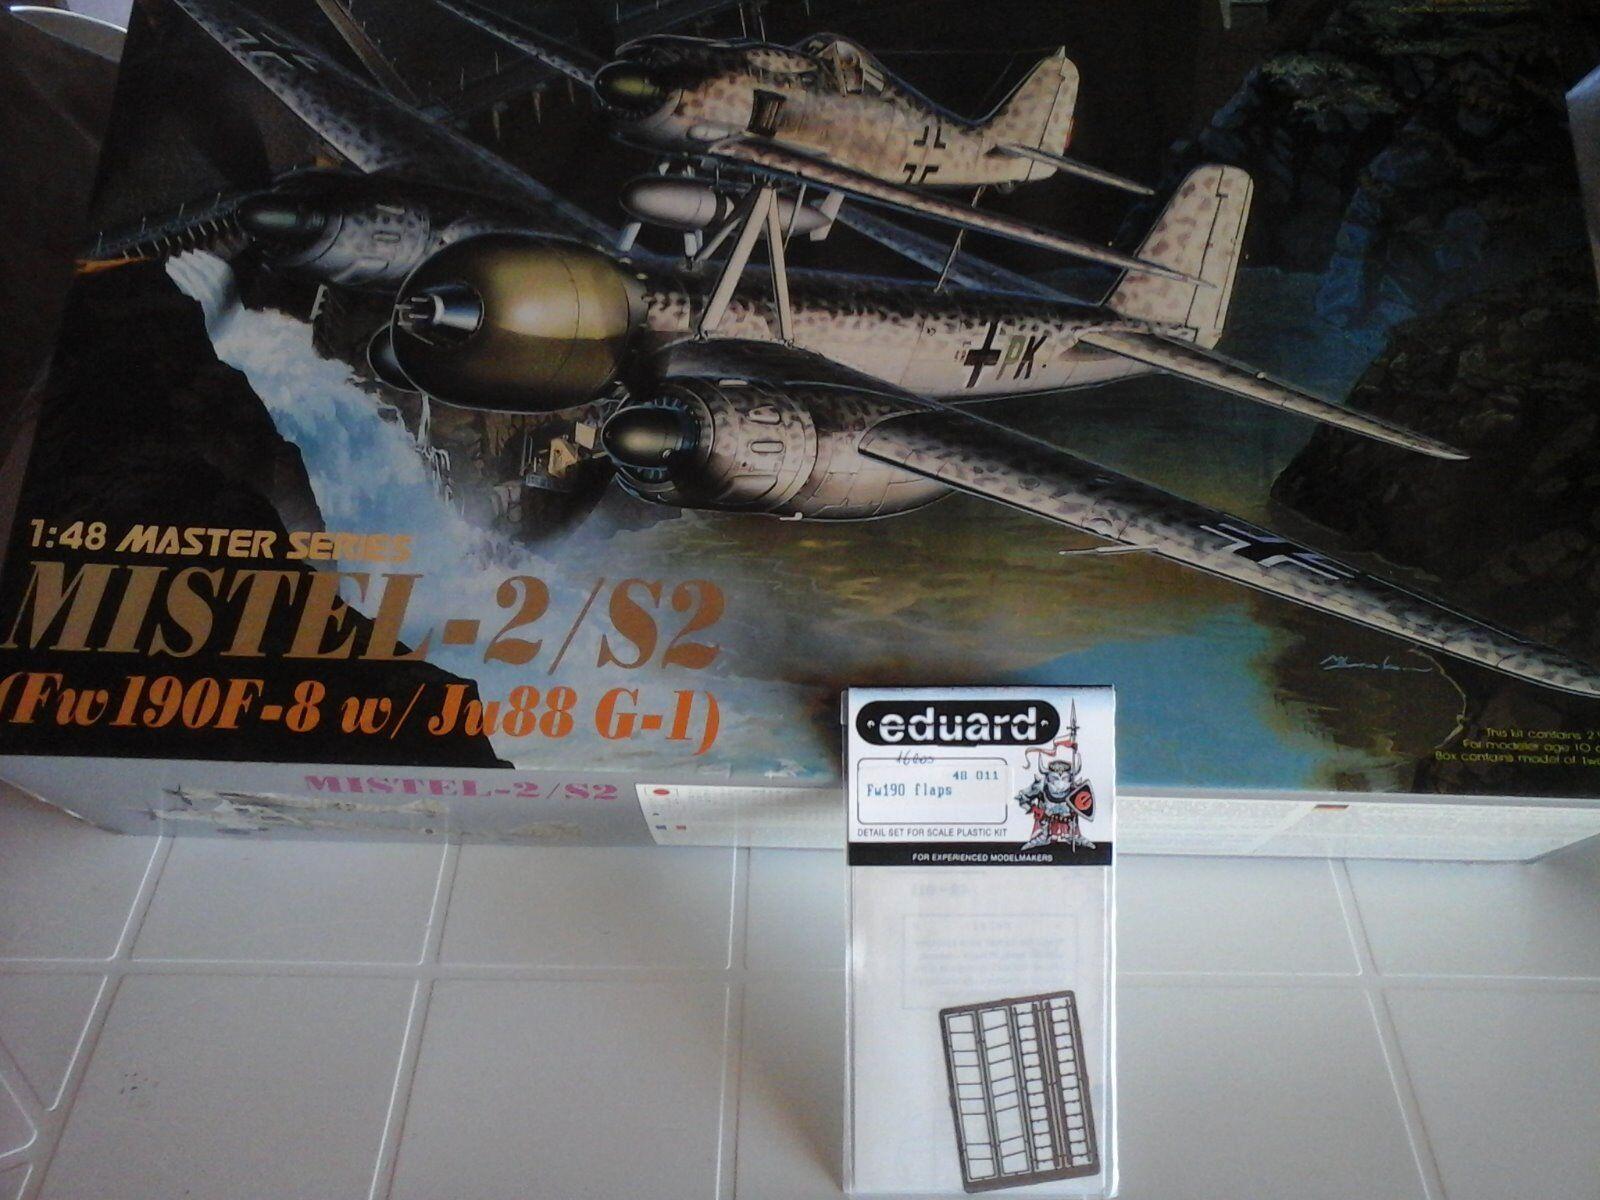 MISTEL-2 S2(FW190 F8W JU88G-1) 1 48 SCALE DRAGON MODEL+N.2 PHOTOETCHED PARTS